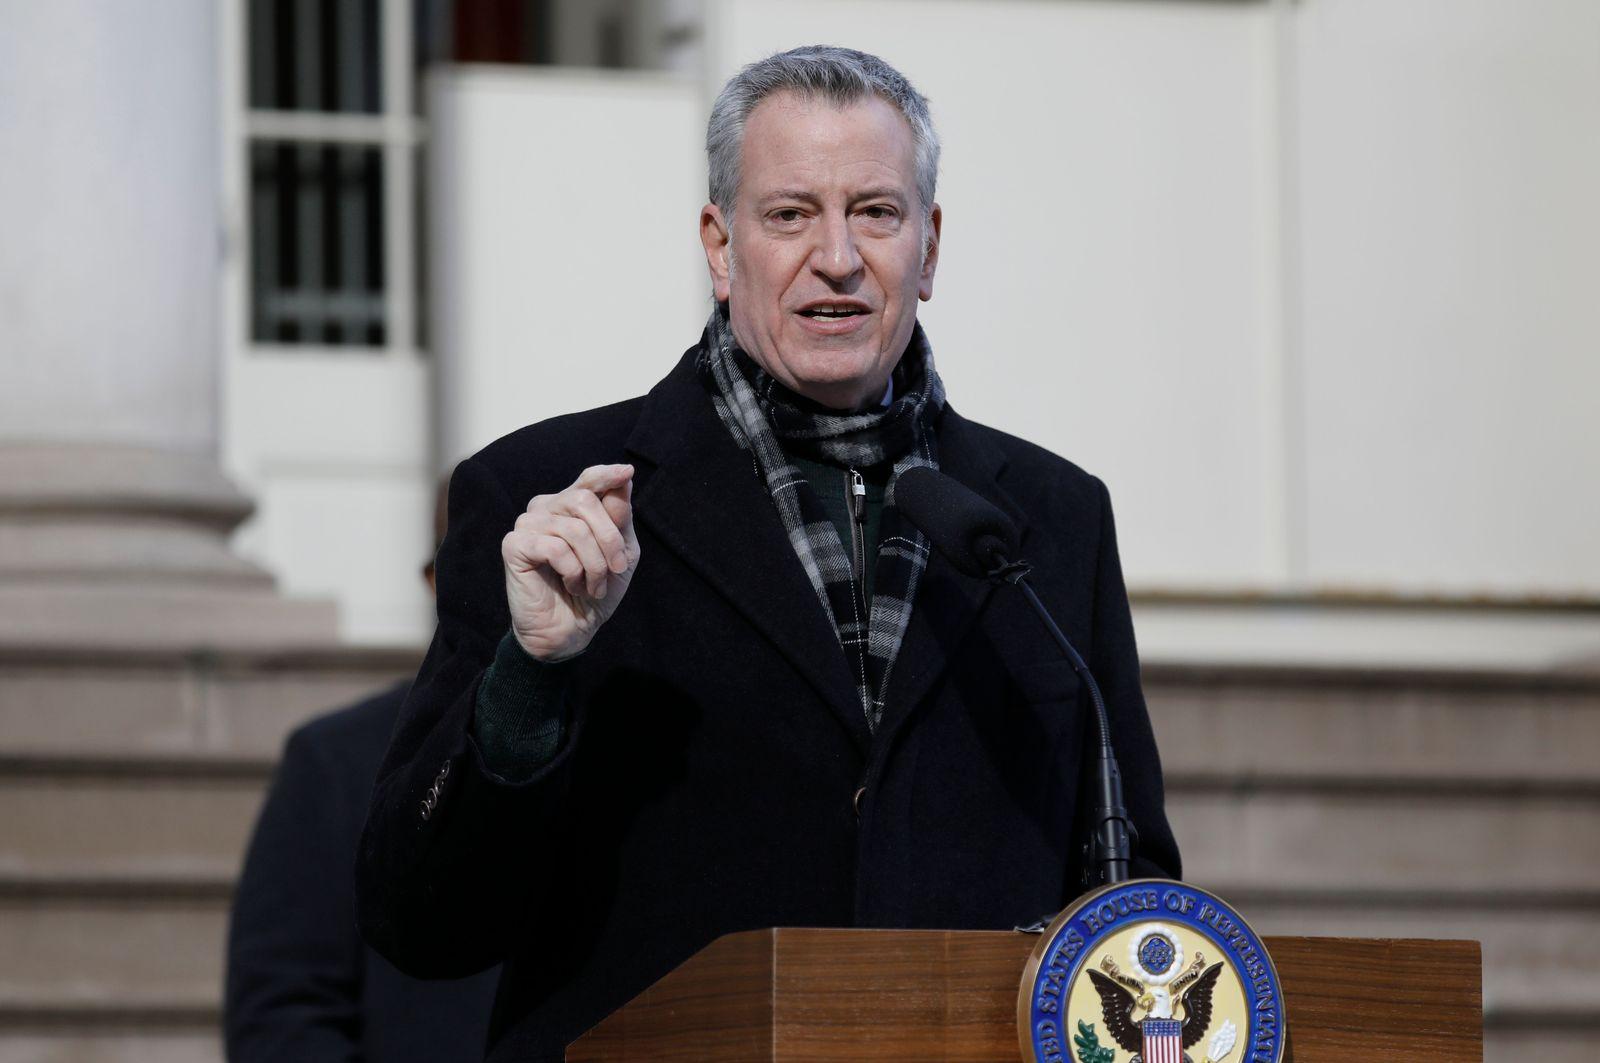 New York's Congressional Delegation Demands Trump Impeachment, USA - 09 Jan 2021